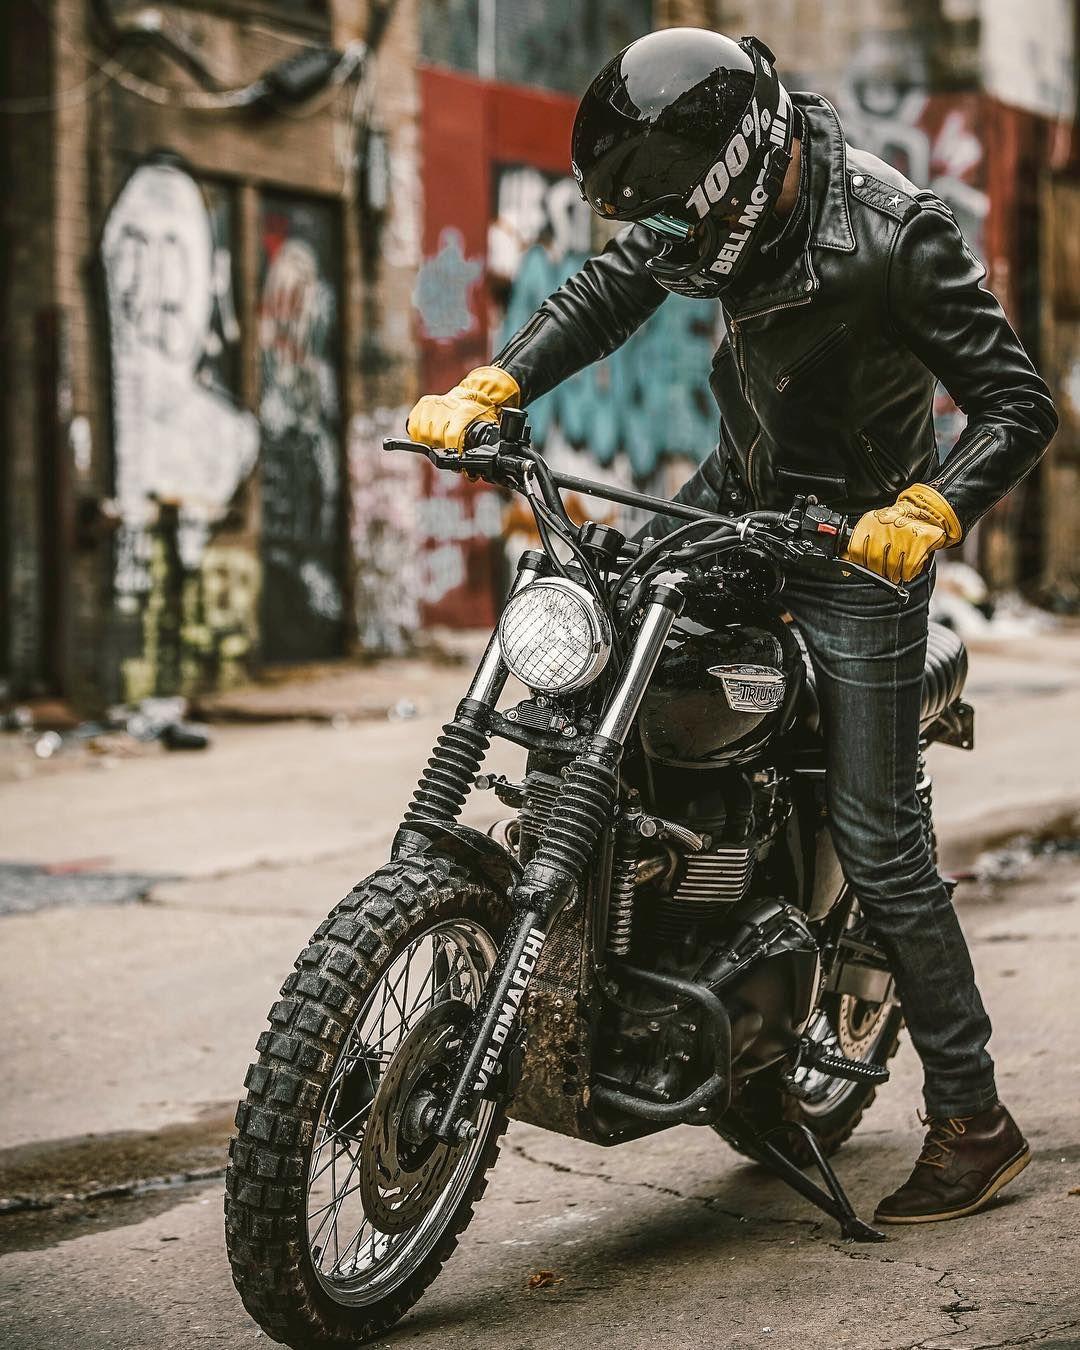 This Is How I Get On My Scrambler Incase Anyone Was Wondering Catsoutofthebag Motorrad Motorrad Mode